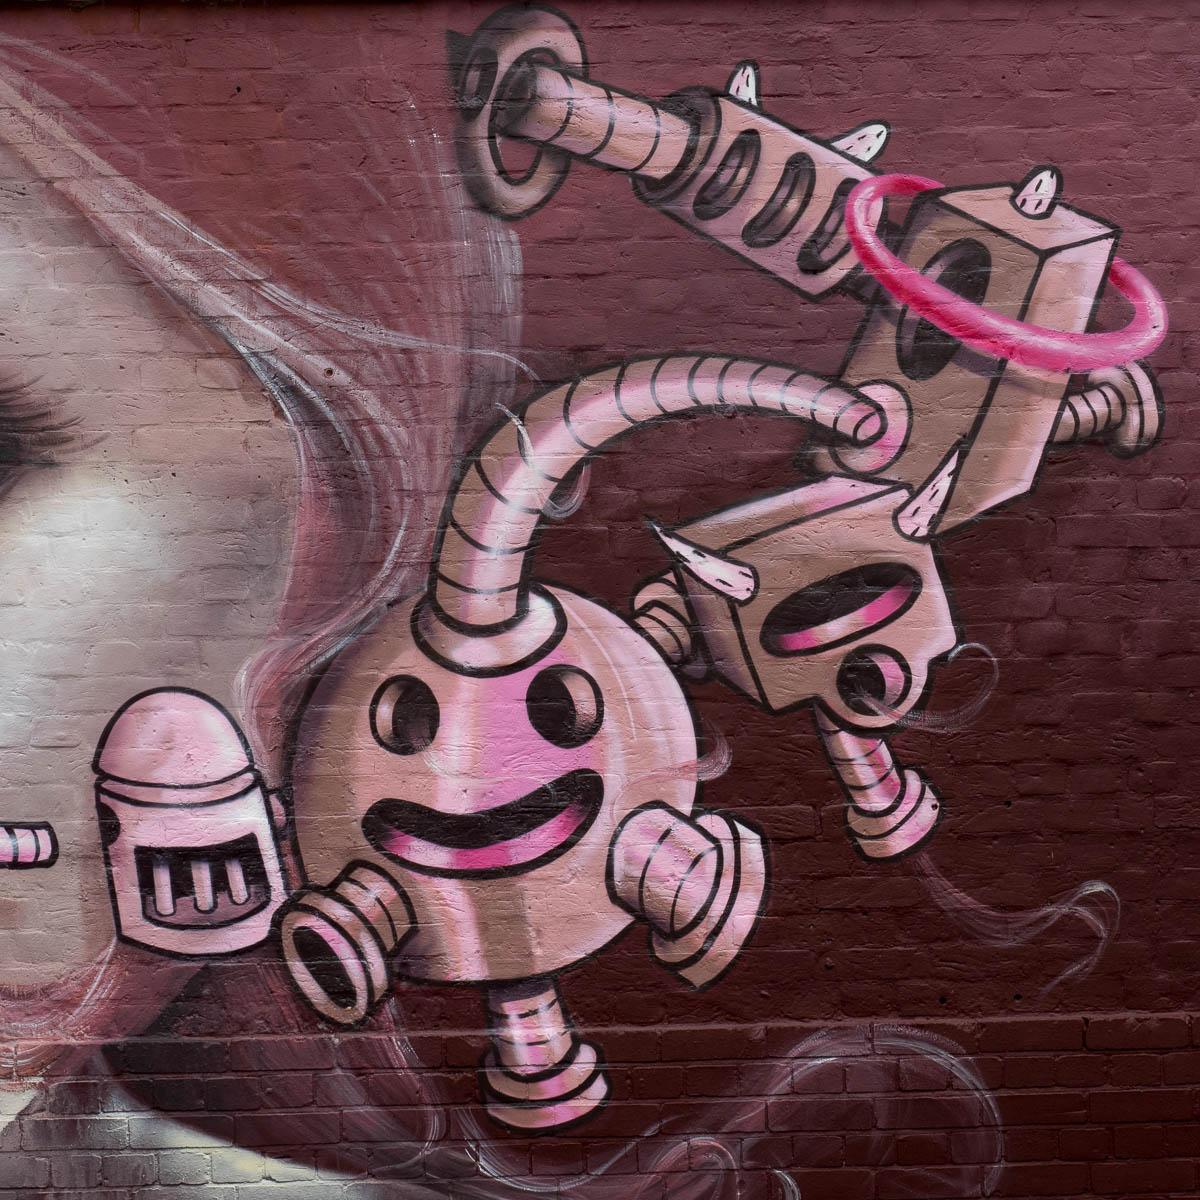 London Graffiti Camden Caro Pepe